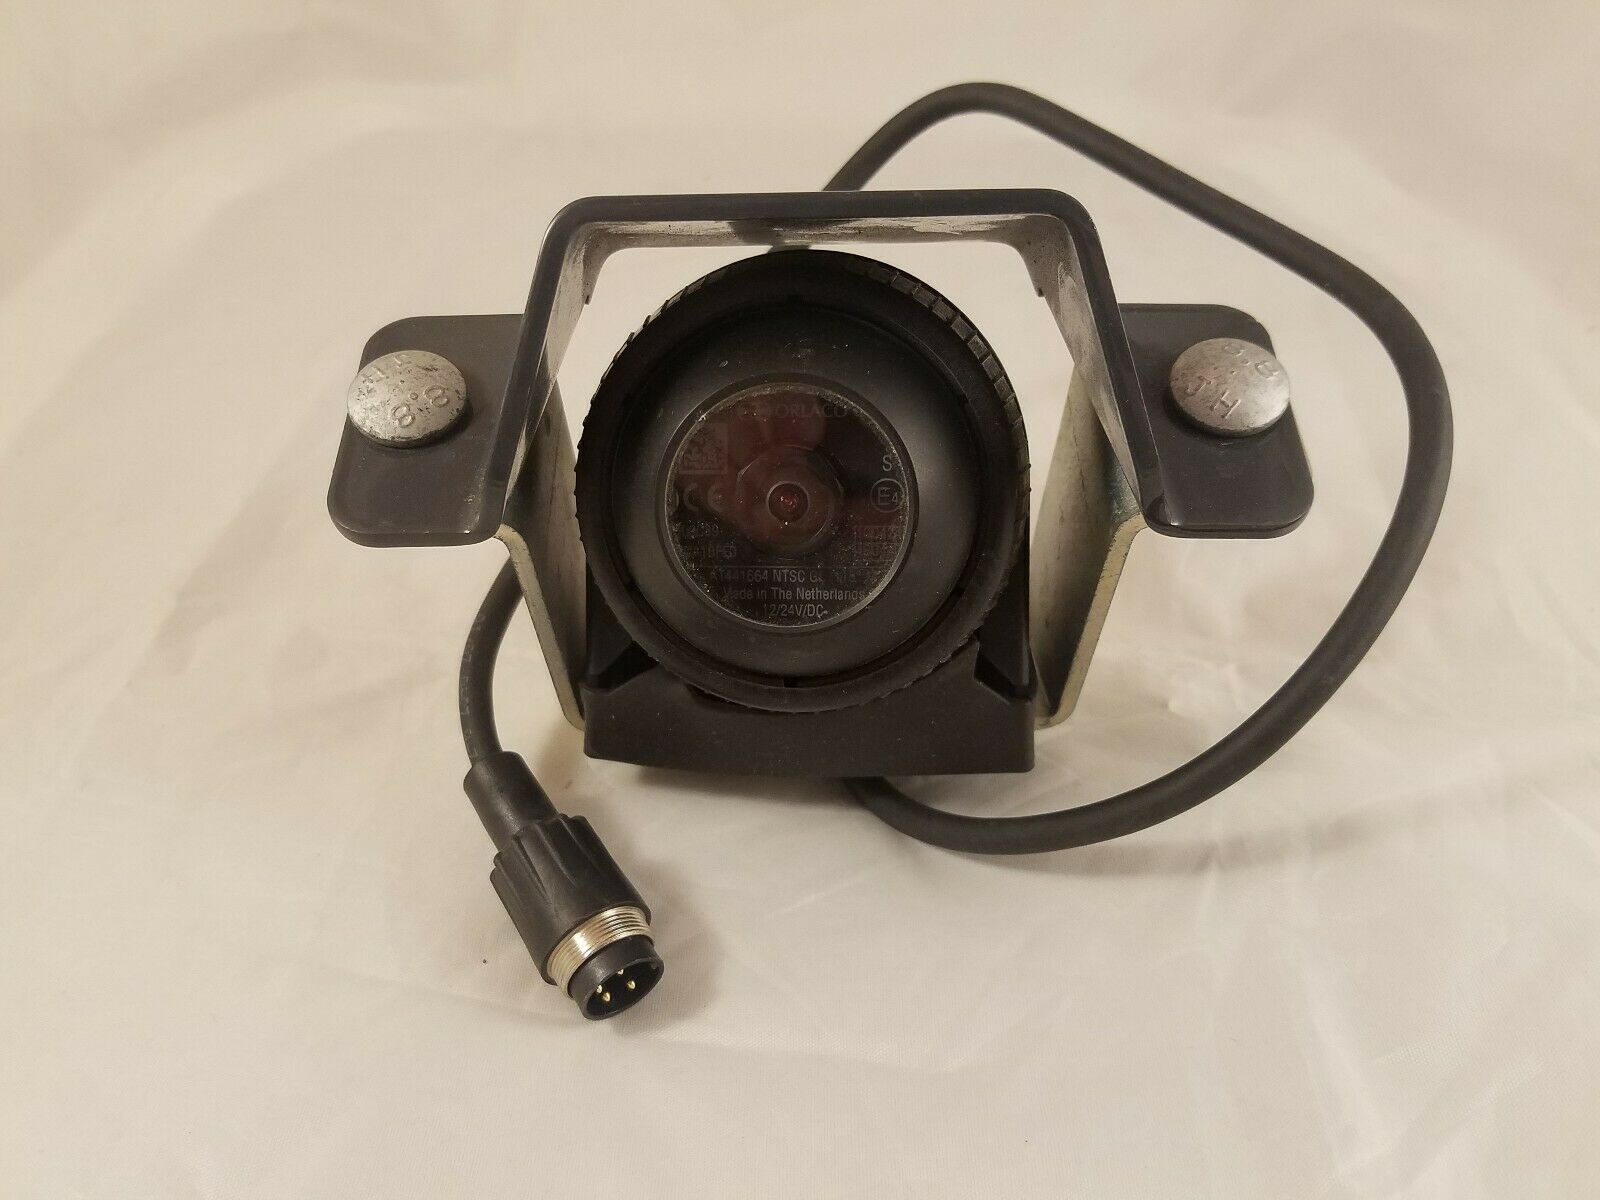 Orlaco 4 Pin MILMOS Backup Camera CGLOC89 AT441664 NTSG GL 118 Degrees 12/24V DC